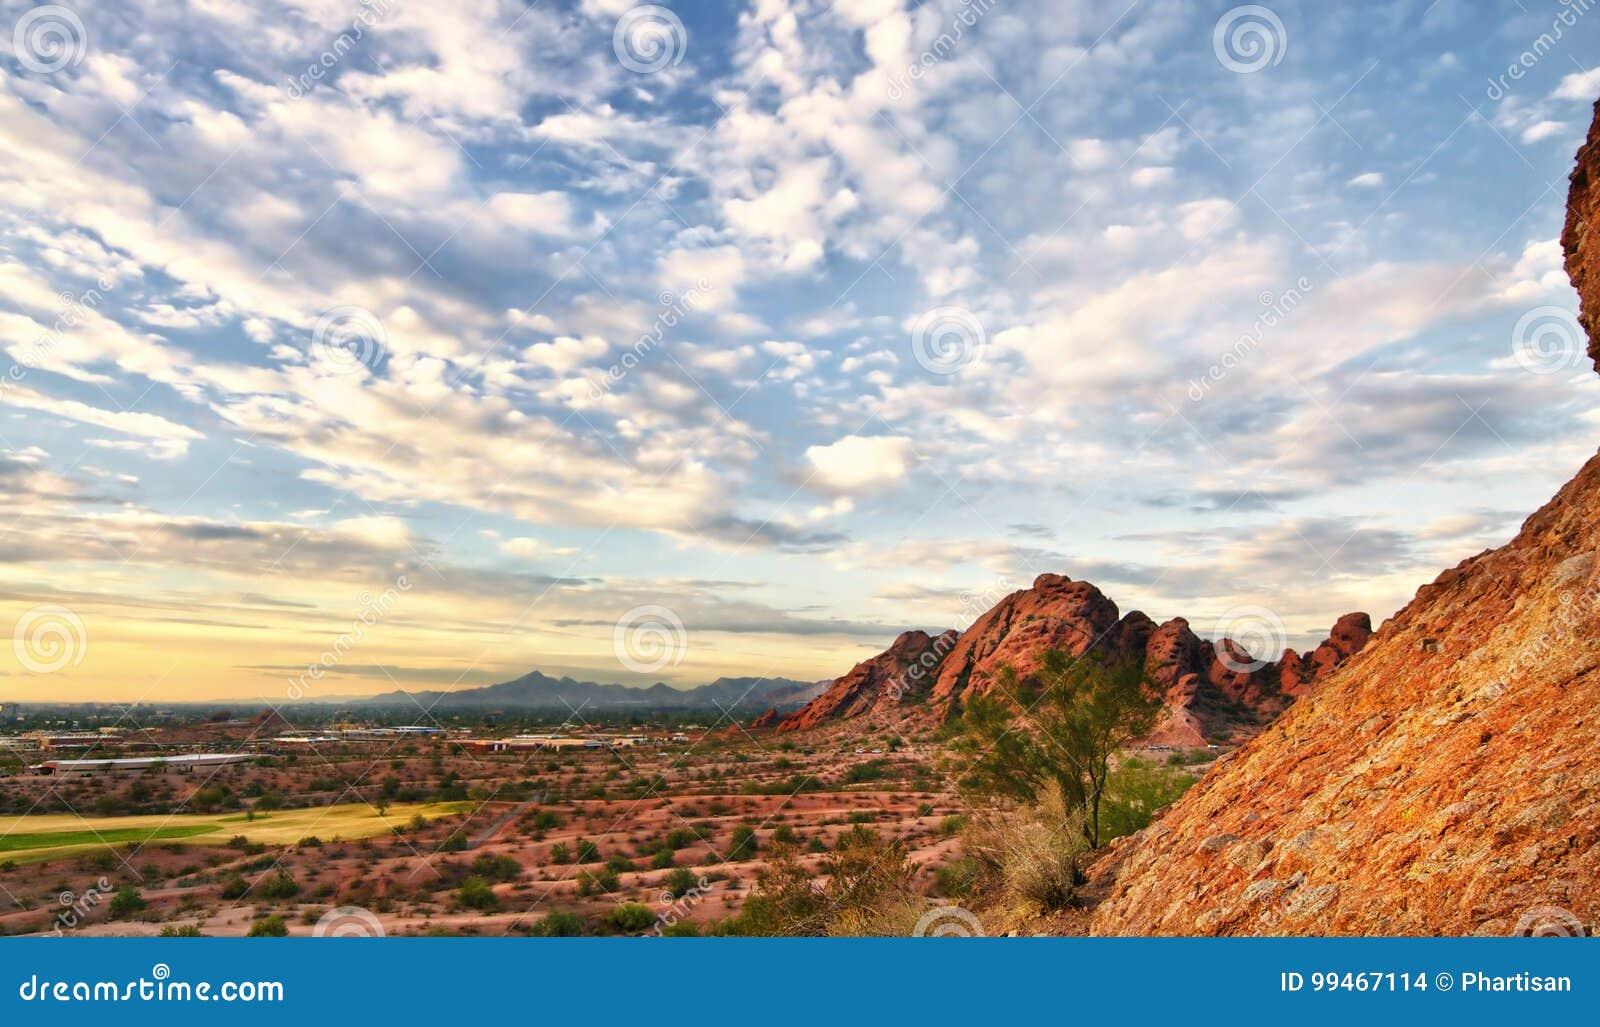 Arizona desert landscape Papago Park Phoenix